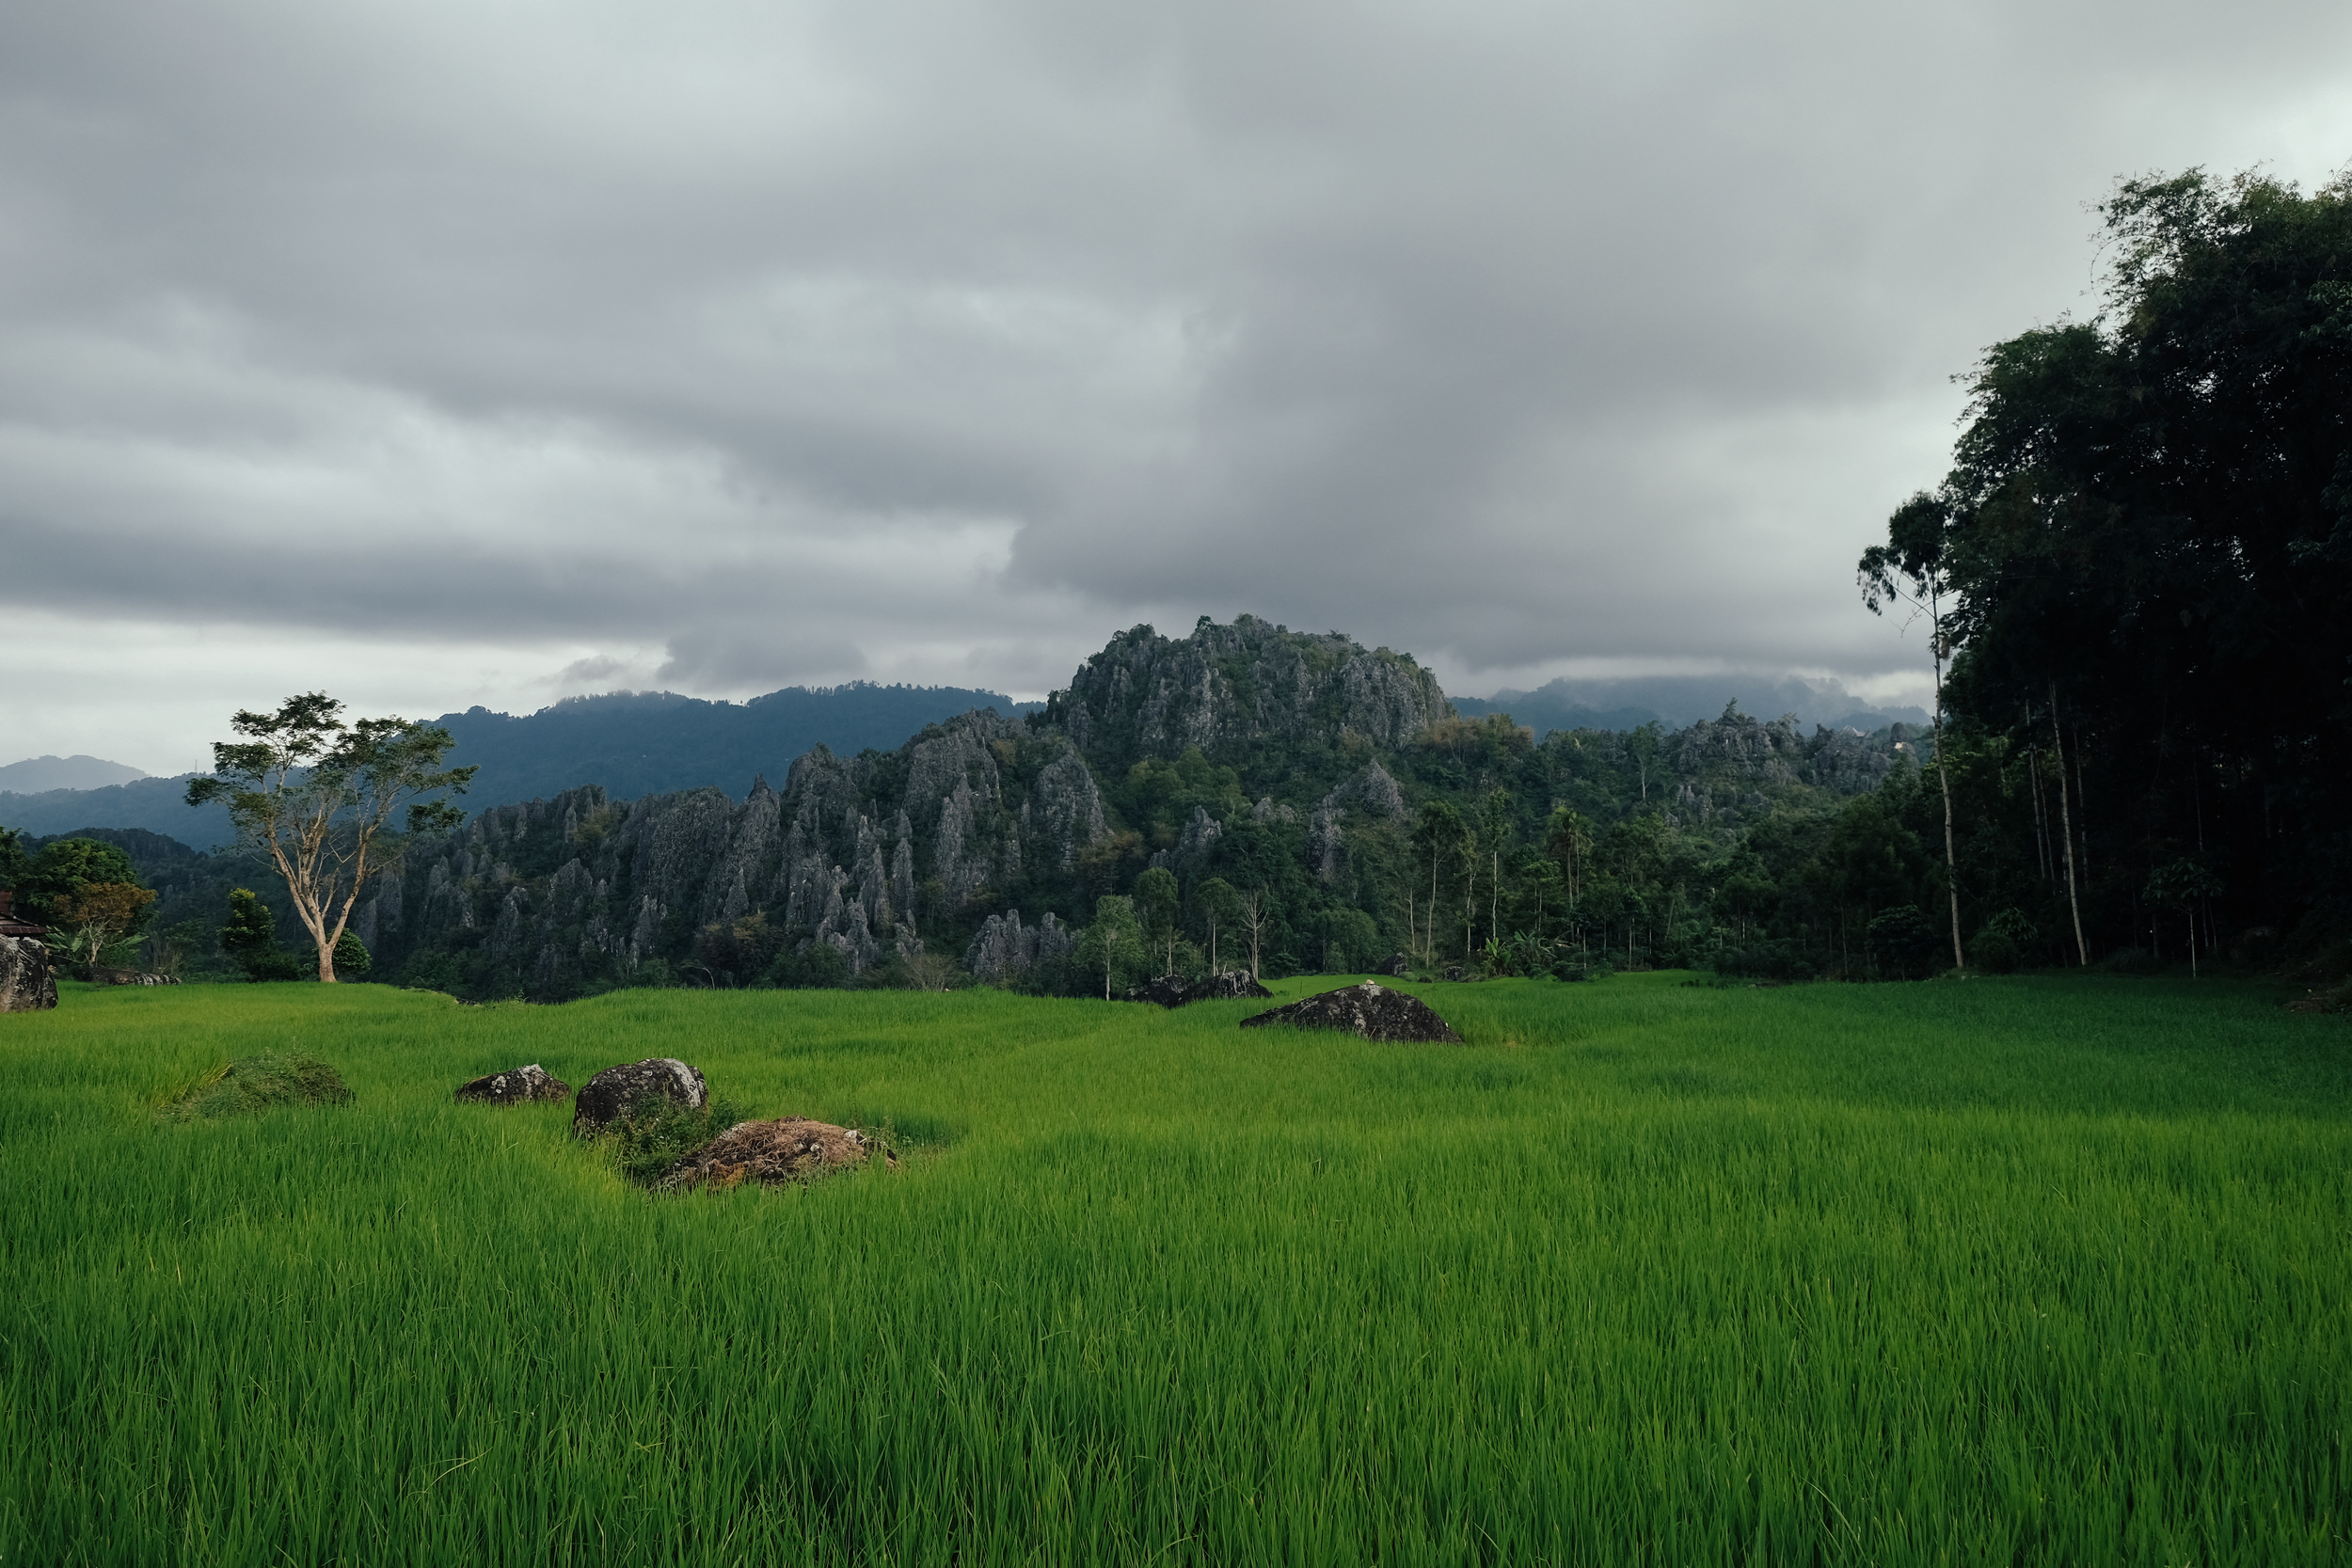 A wall of karst rocks overlook serene padi fields.